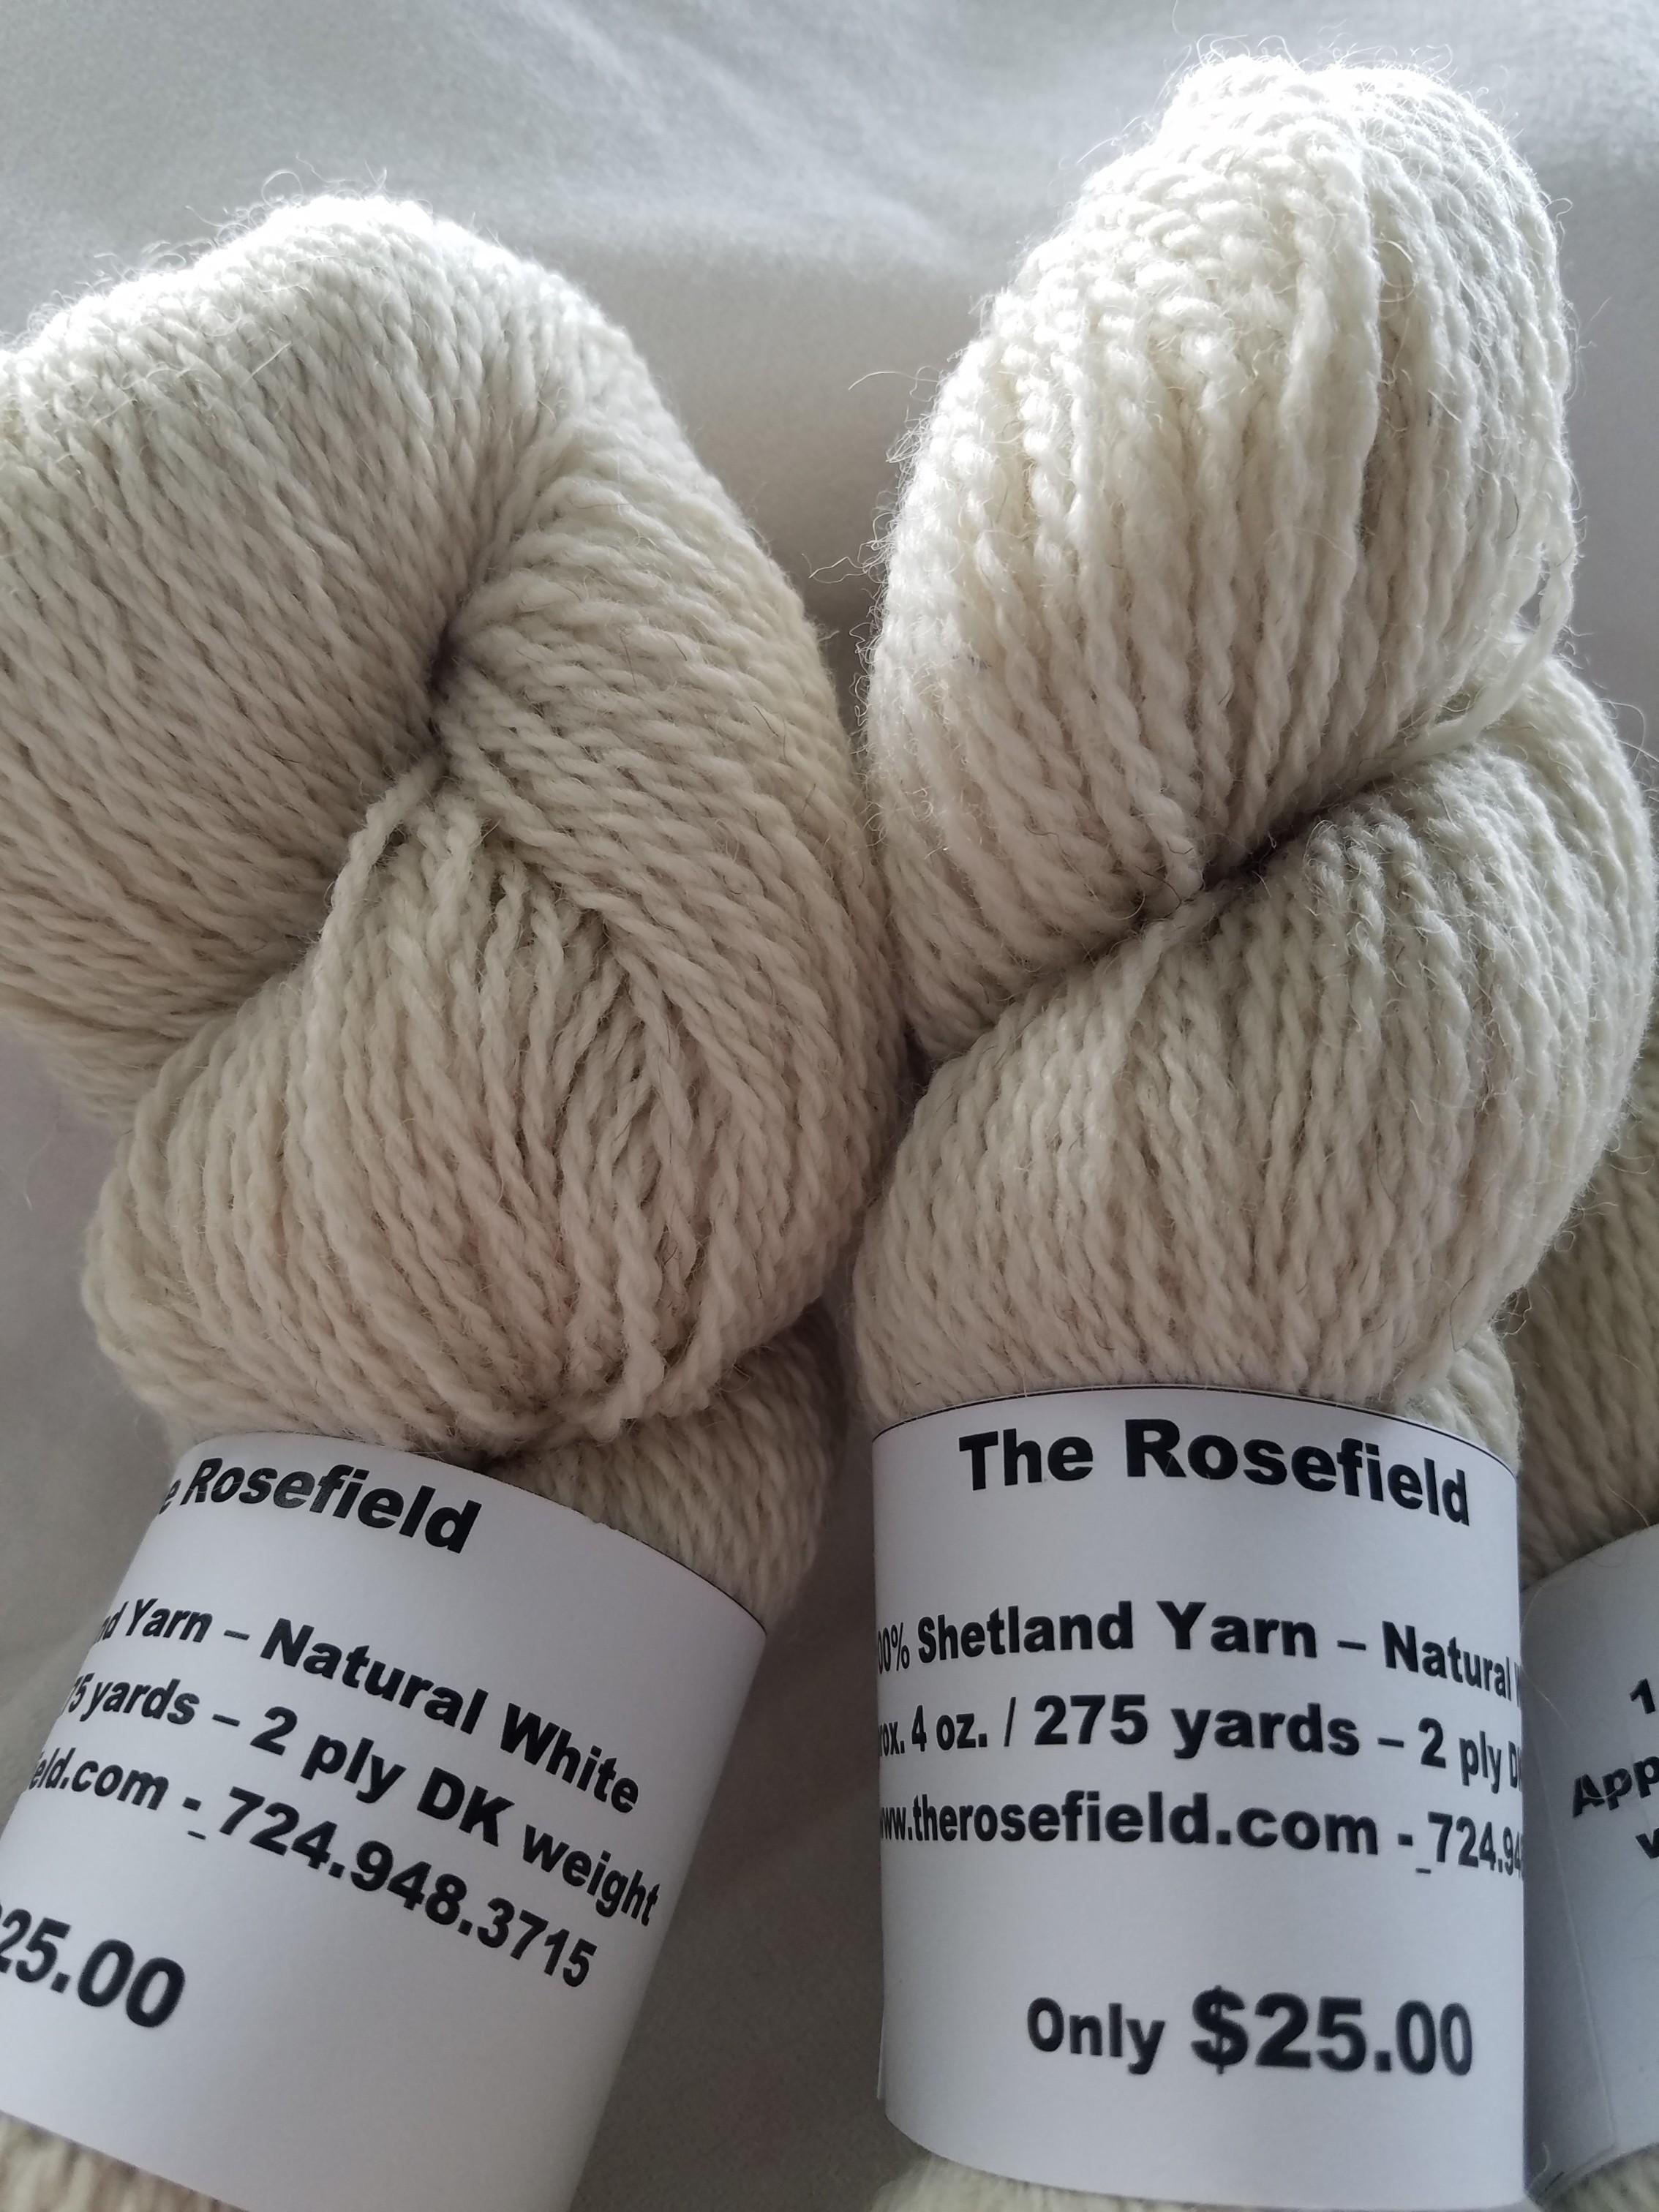 11. White Shetland 2 ply DK weight